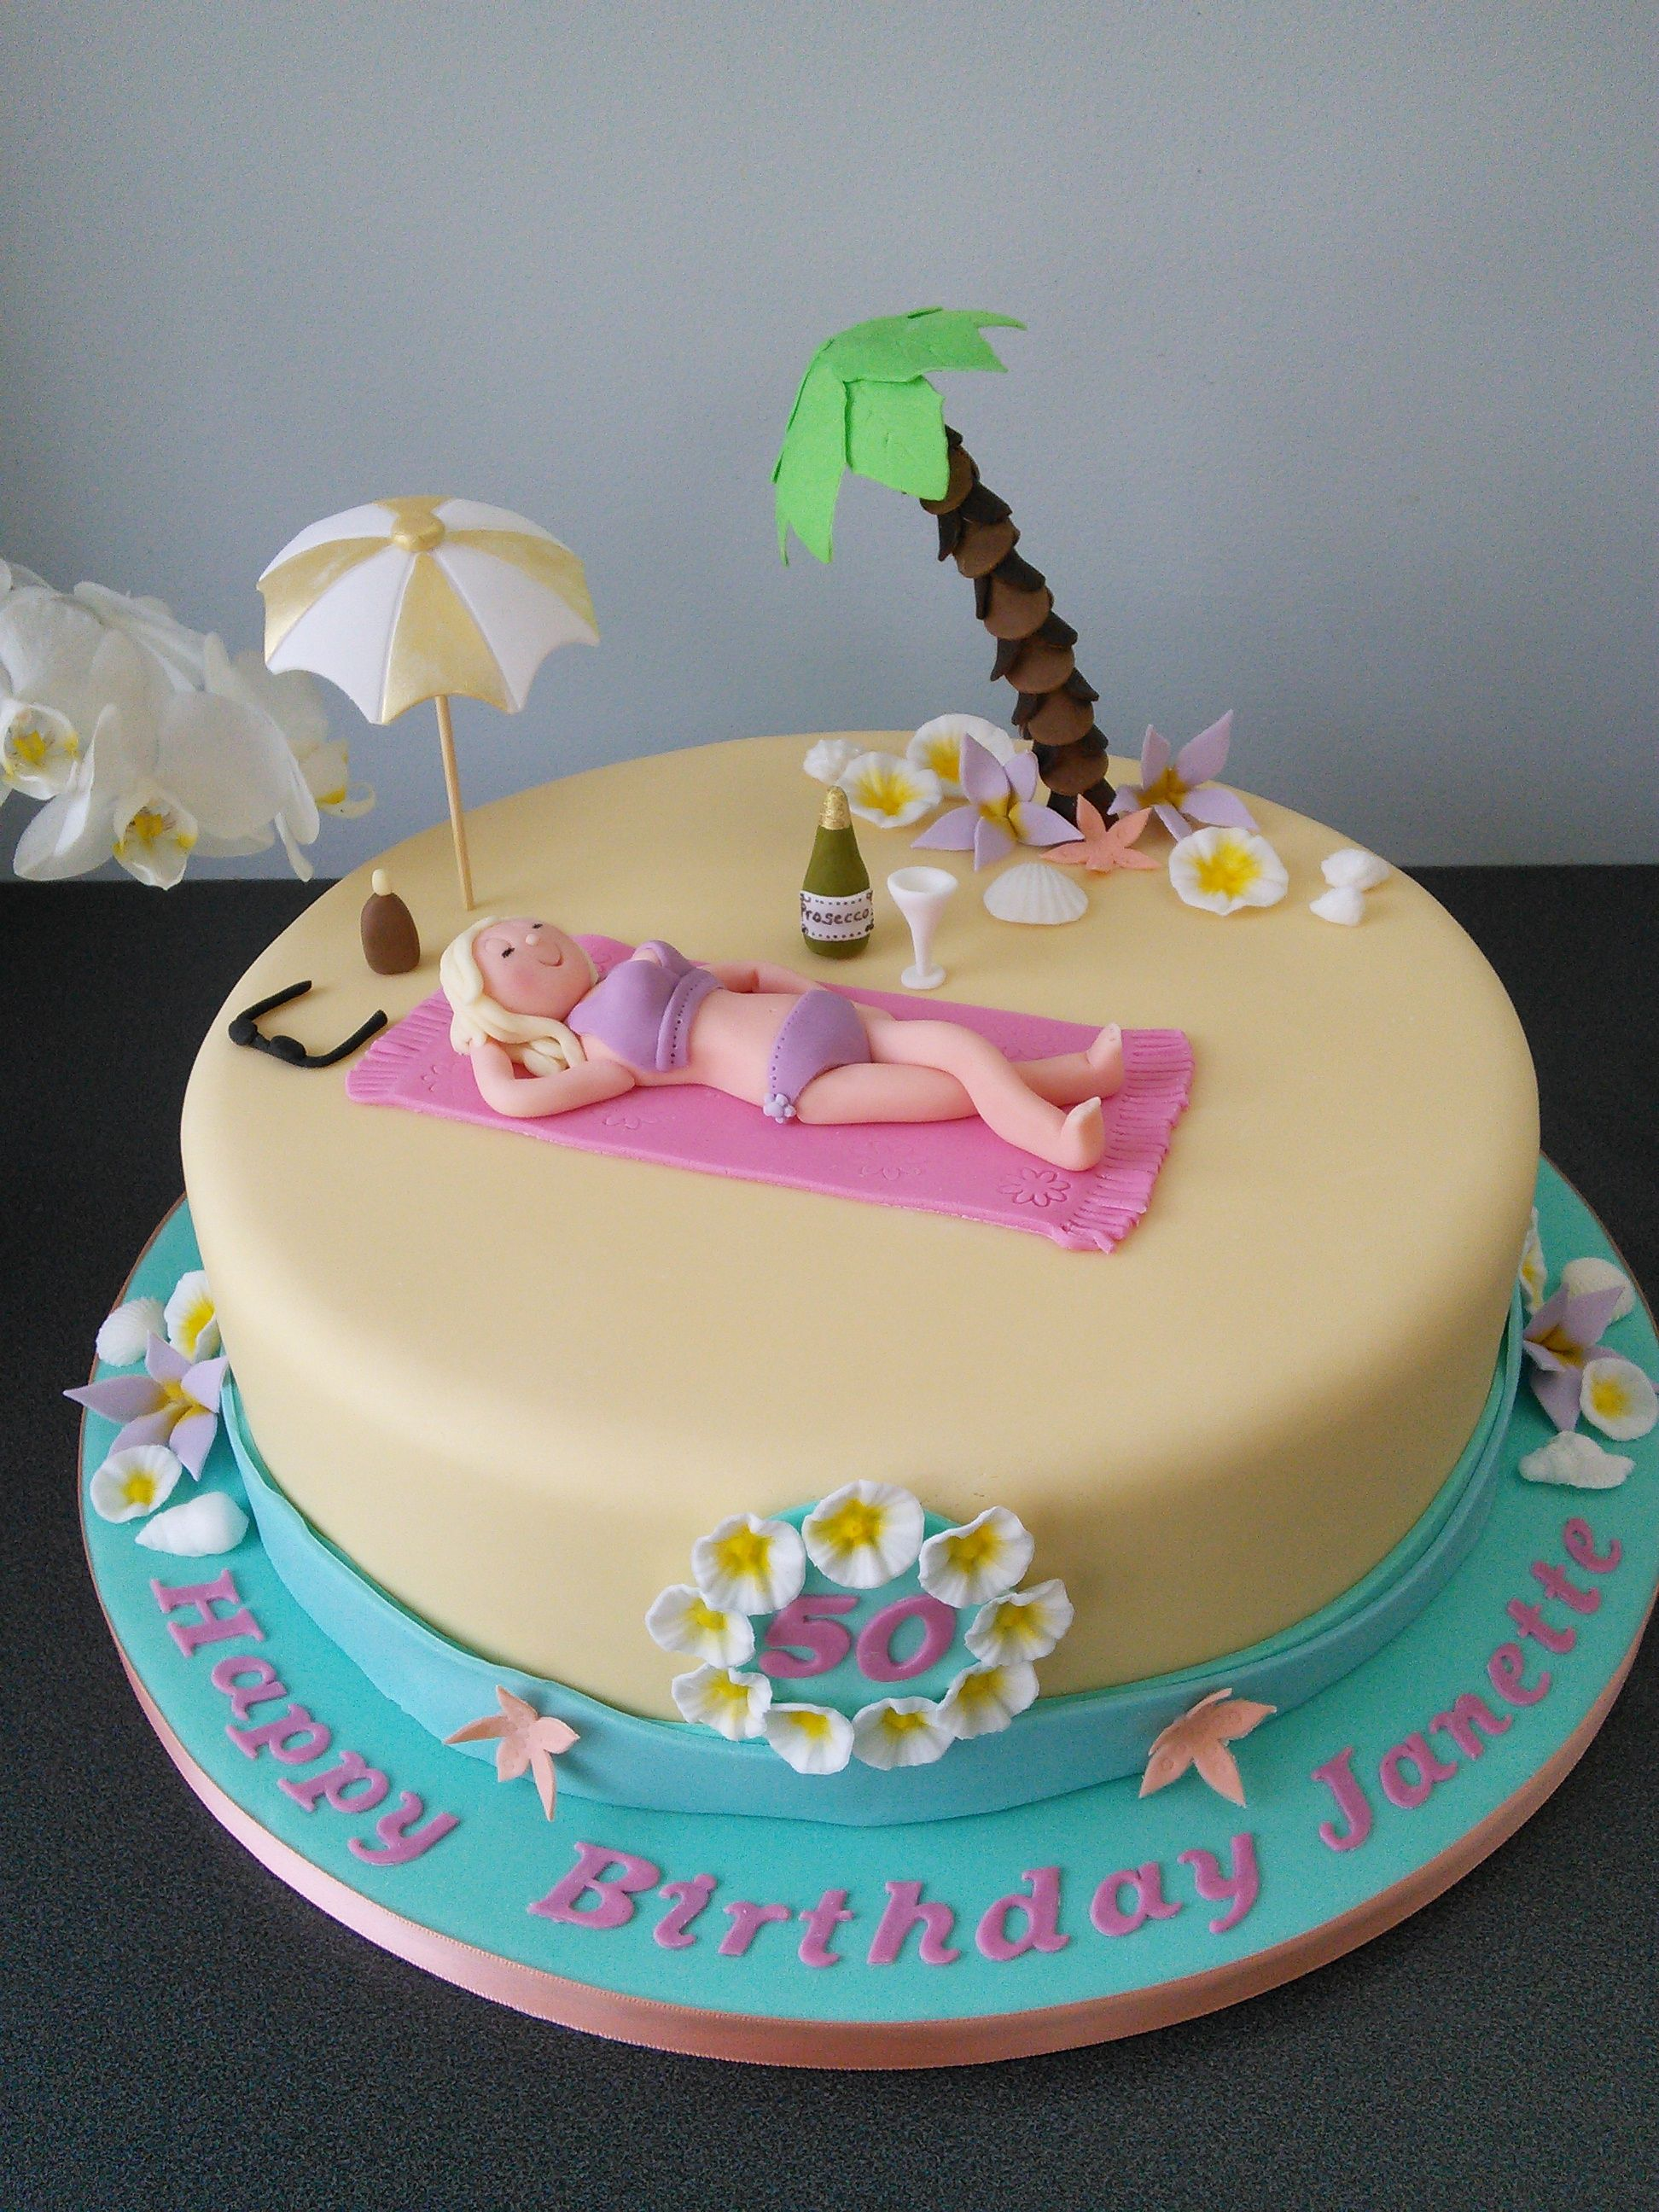 Astounding Beach Cake For 50Th Birthday Sunbathing Umbrella Palm Tree Birthday Cards Printable Trancafe Filternl